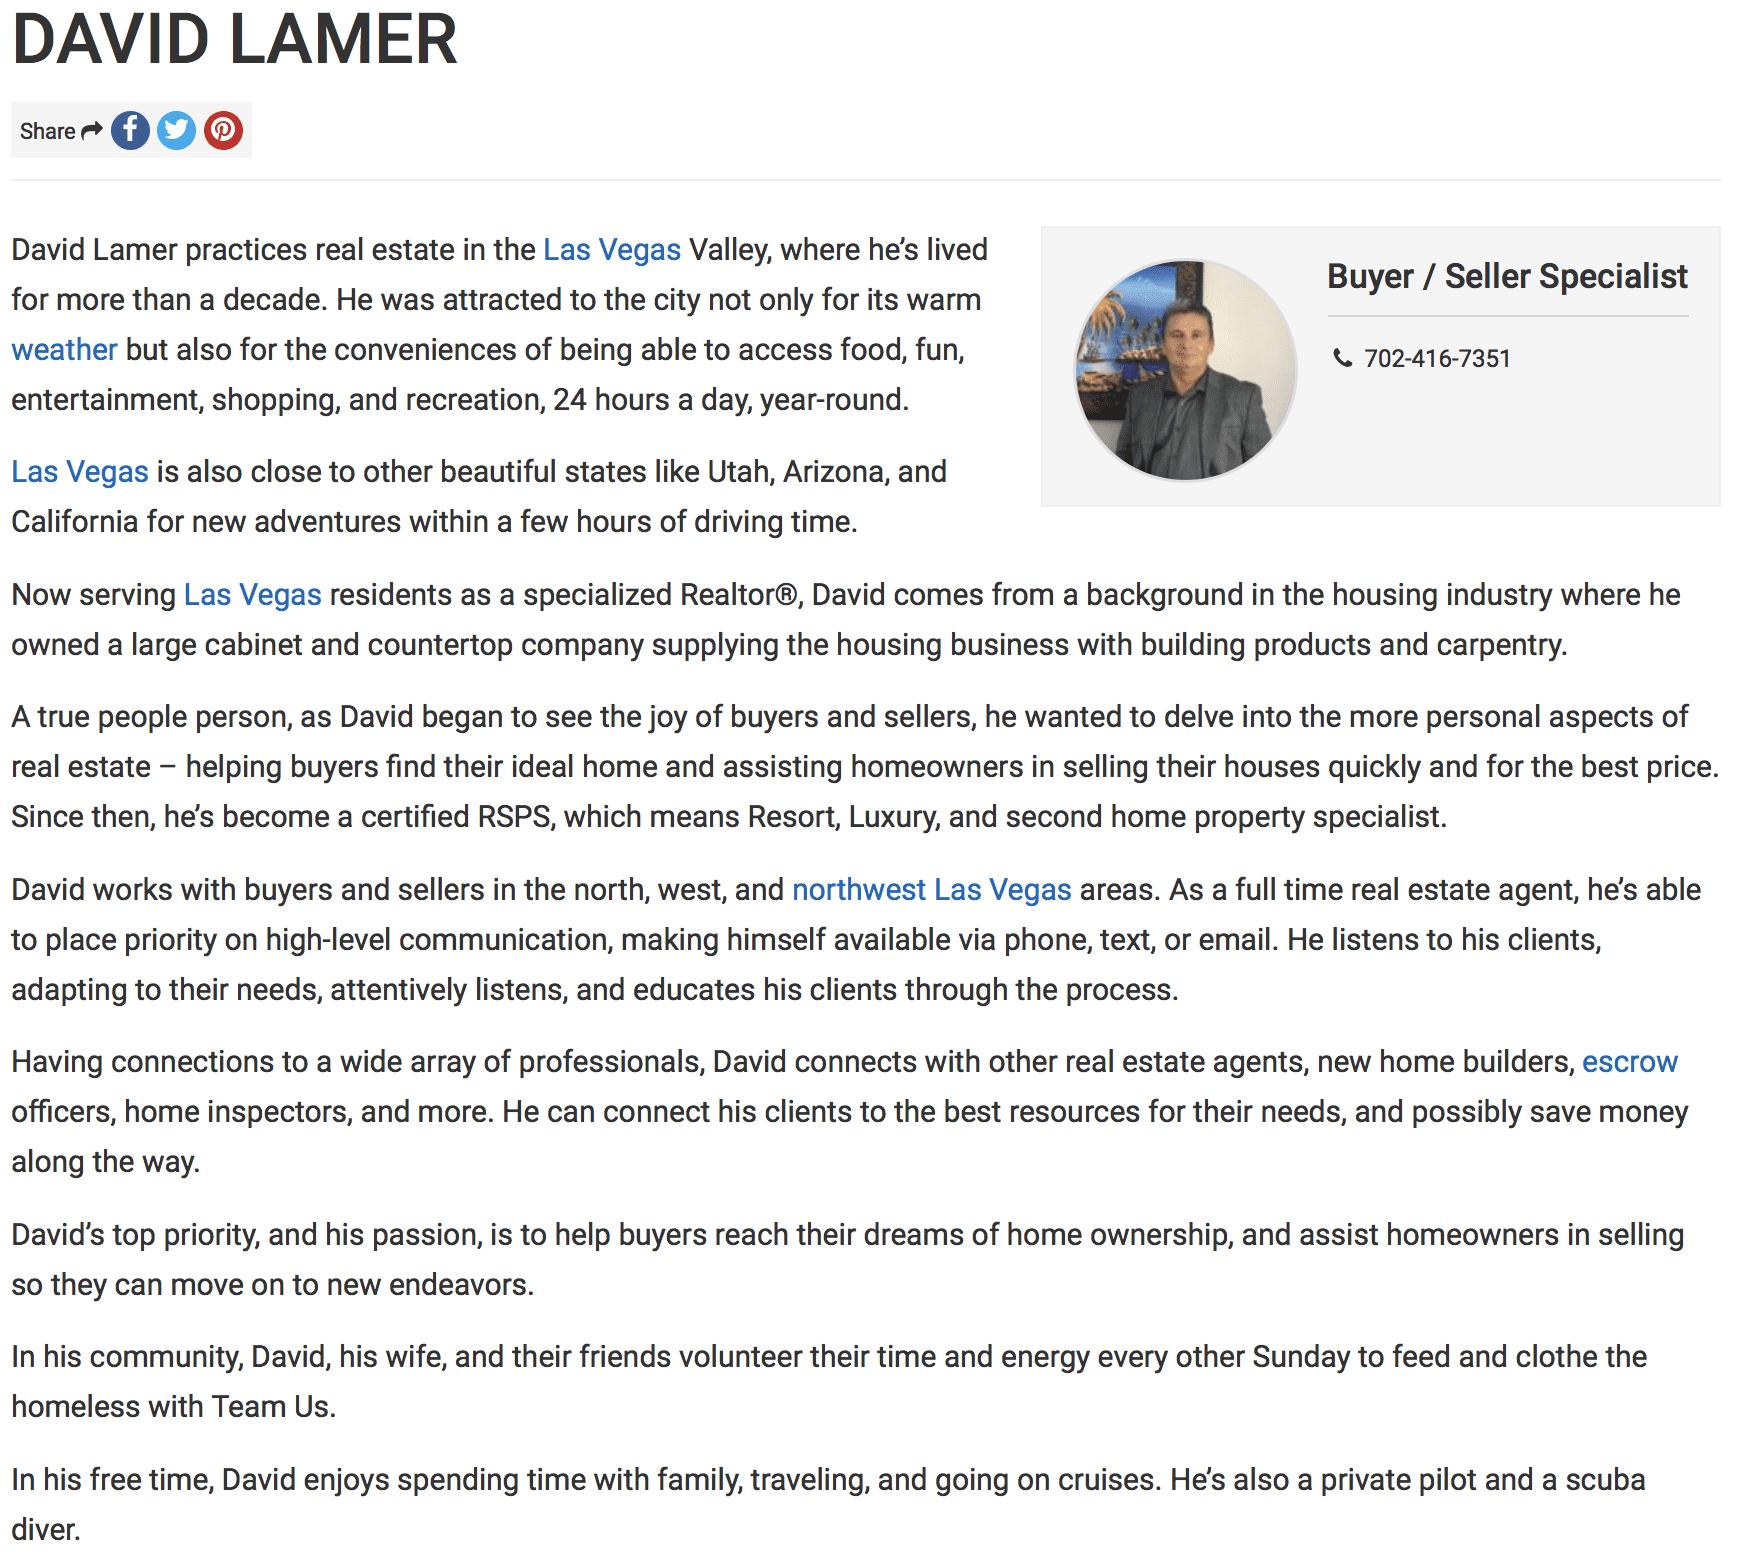 David Lamer is a Las Vegas Real Estate Agent with Lori Ballen Team at Keller Williams